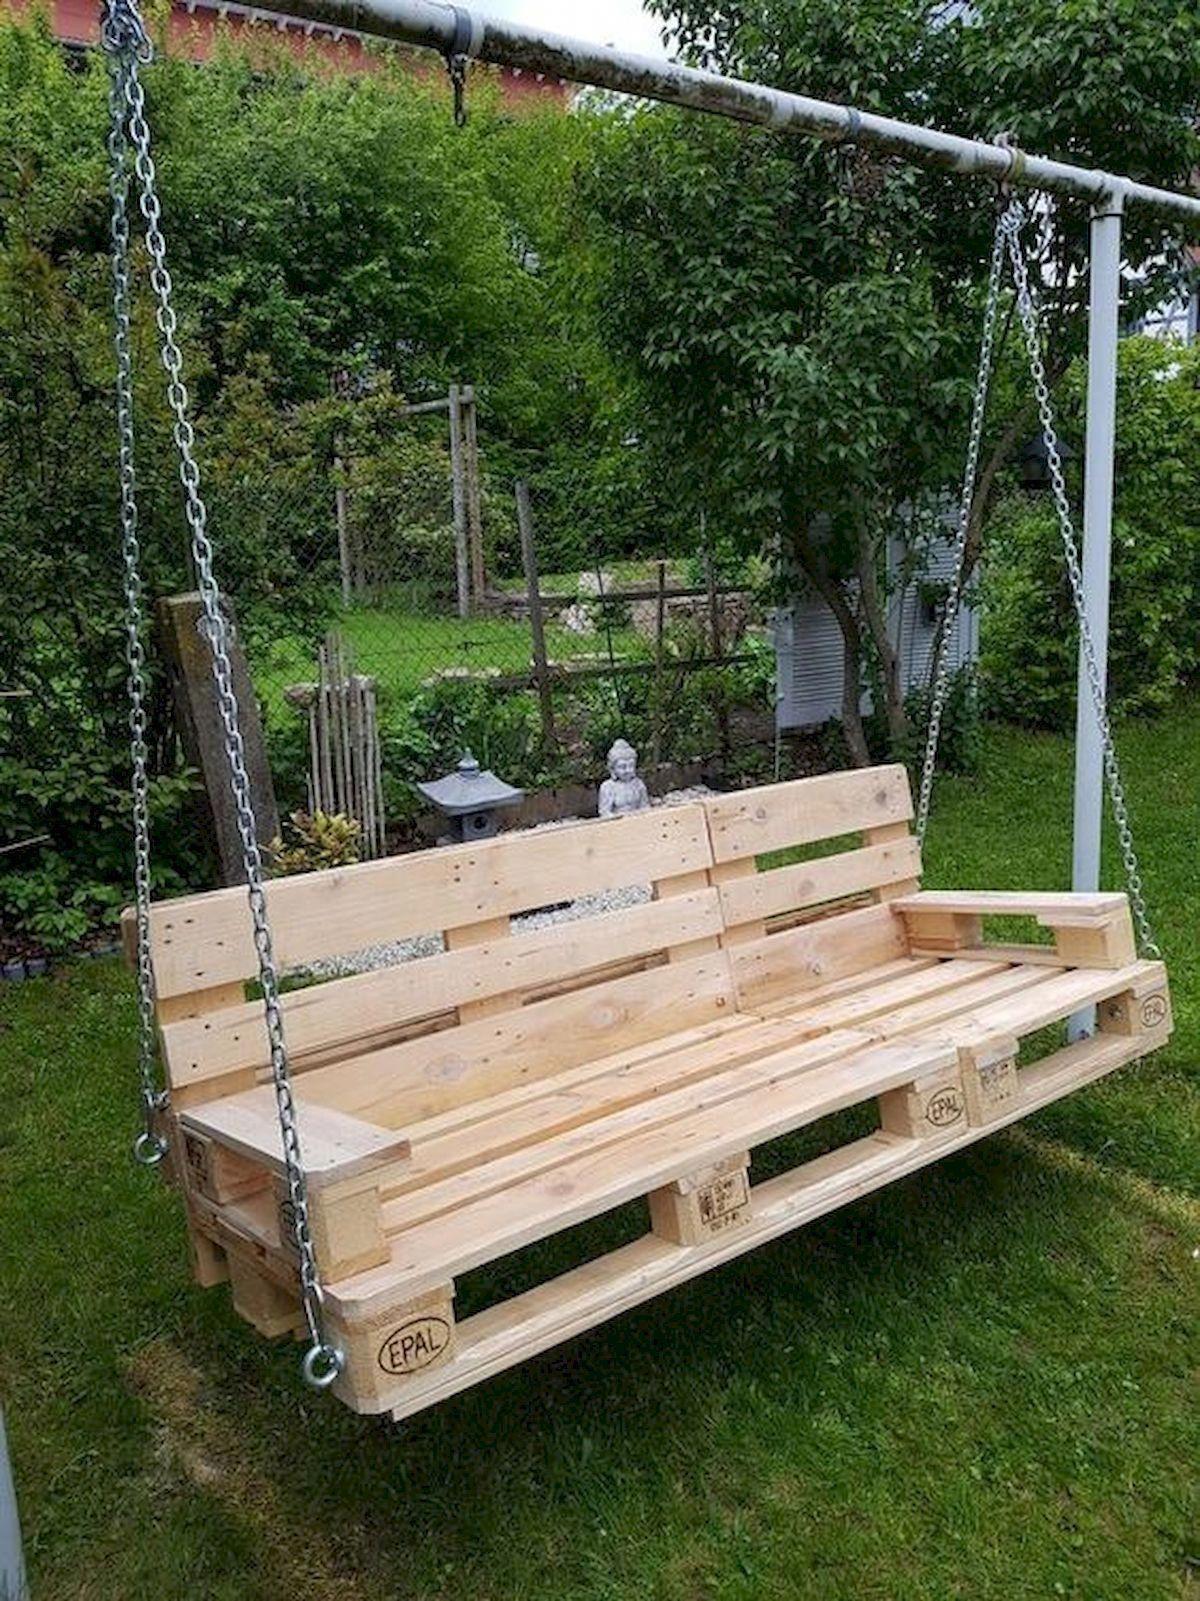 Backyard Landscaping Ideas No Grass Garden Furniture Design Swing Chair Garden Garden Furniture